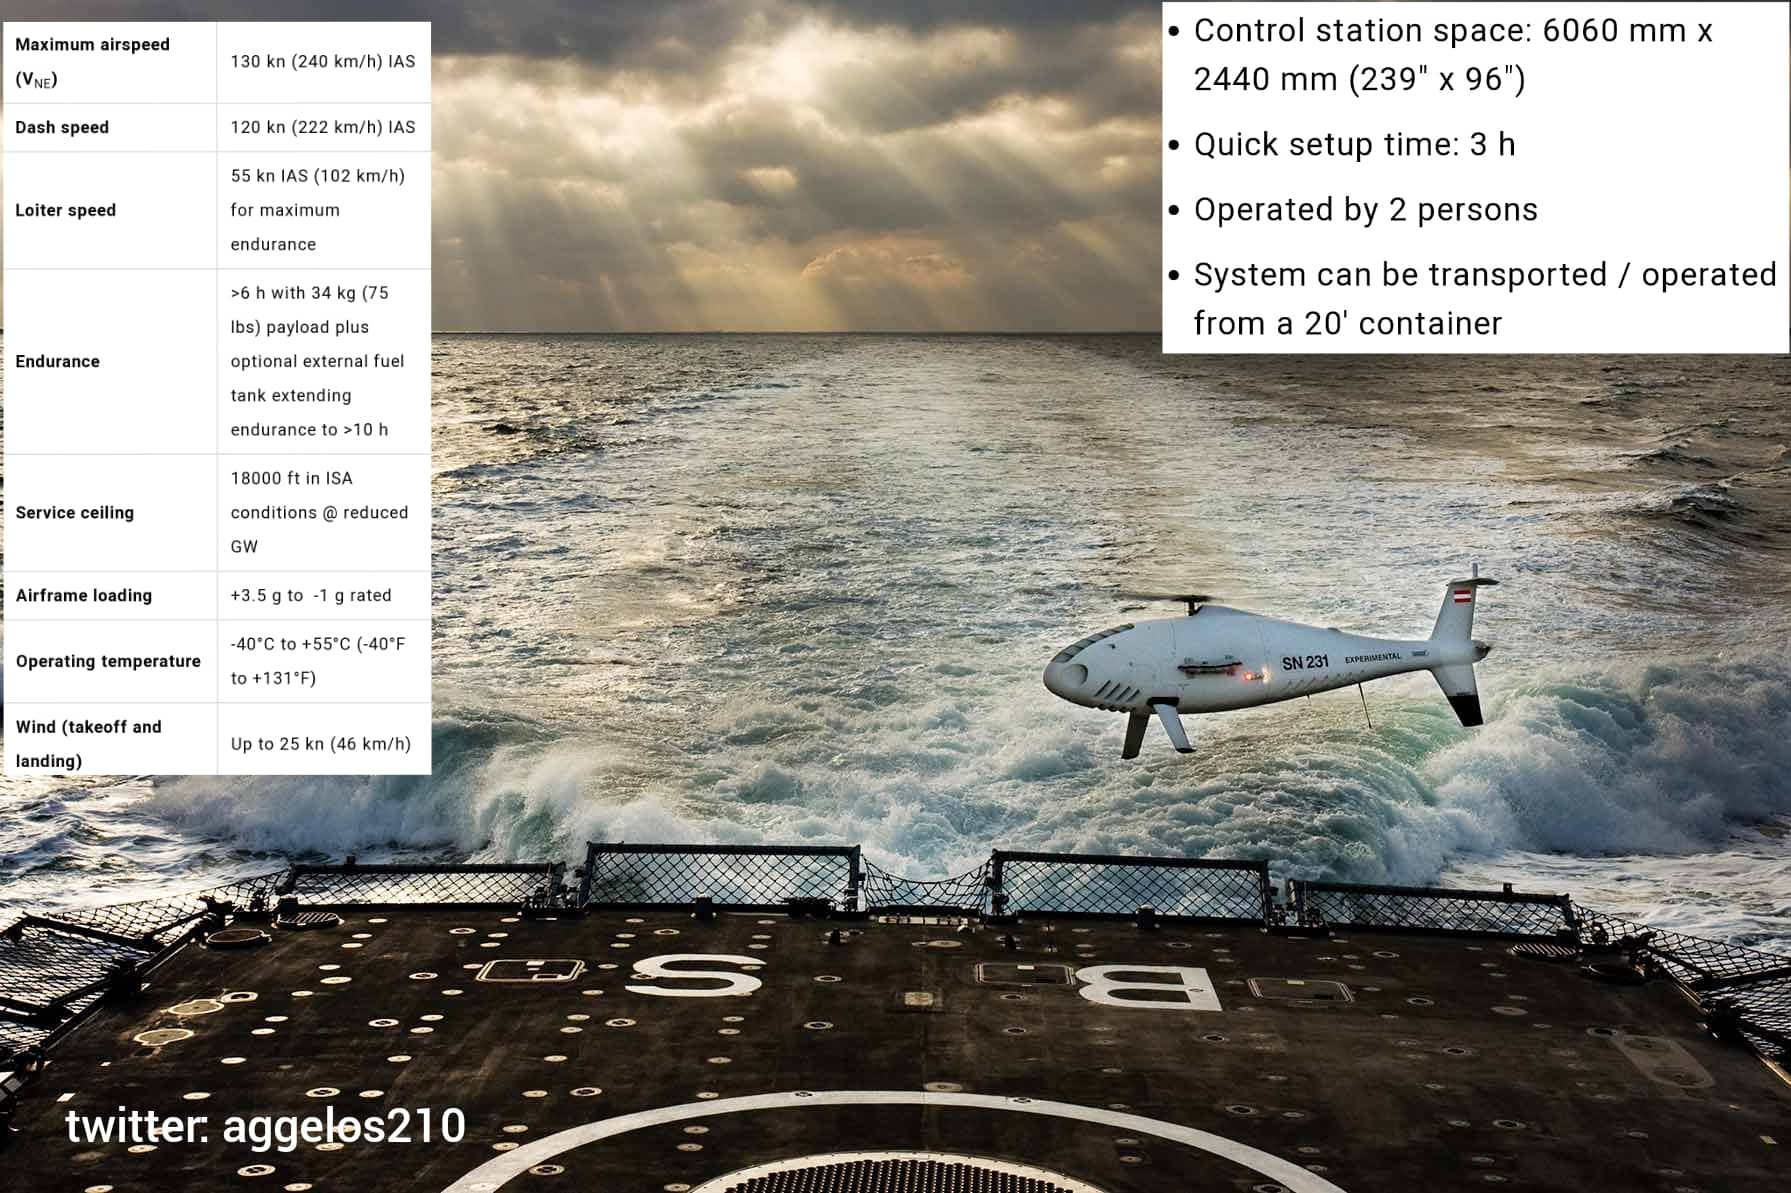 To UAV S-100 Camcοpter στην υπηρεσία του Πολεμικού Ναυτικού – Infographic